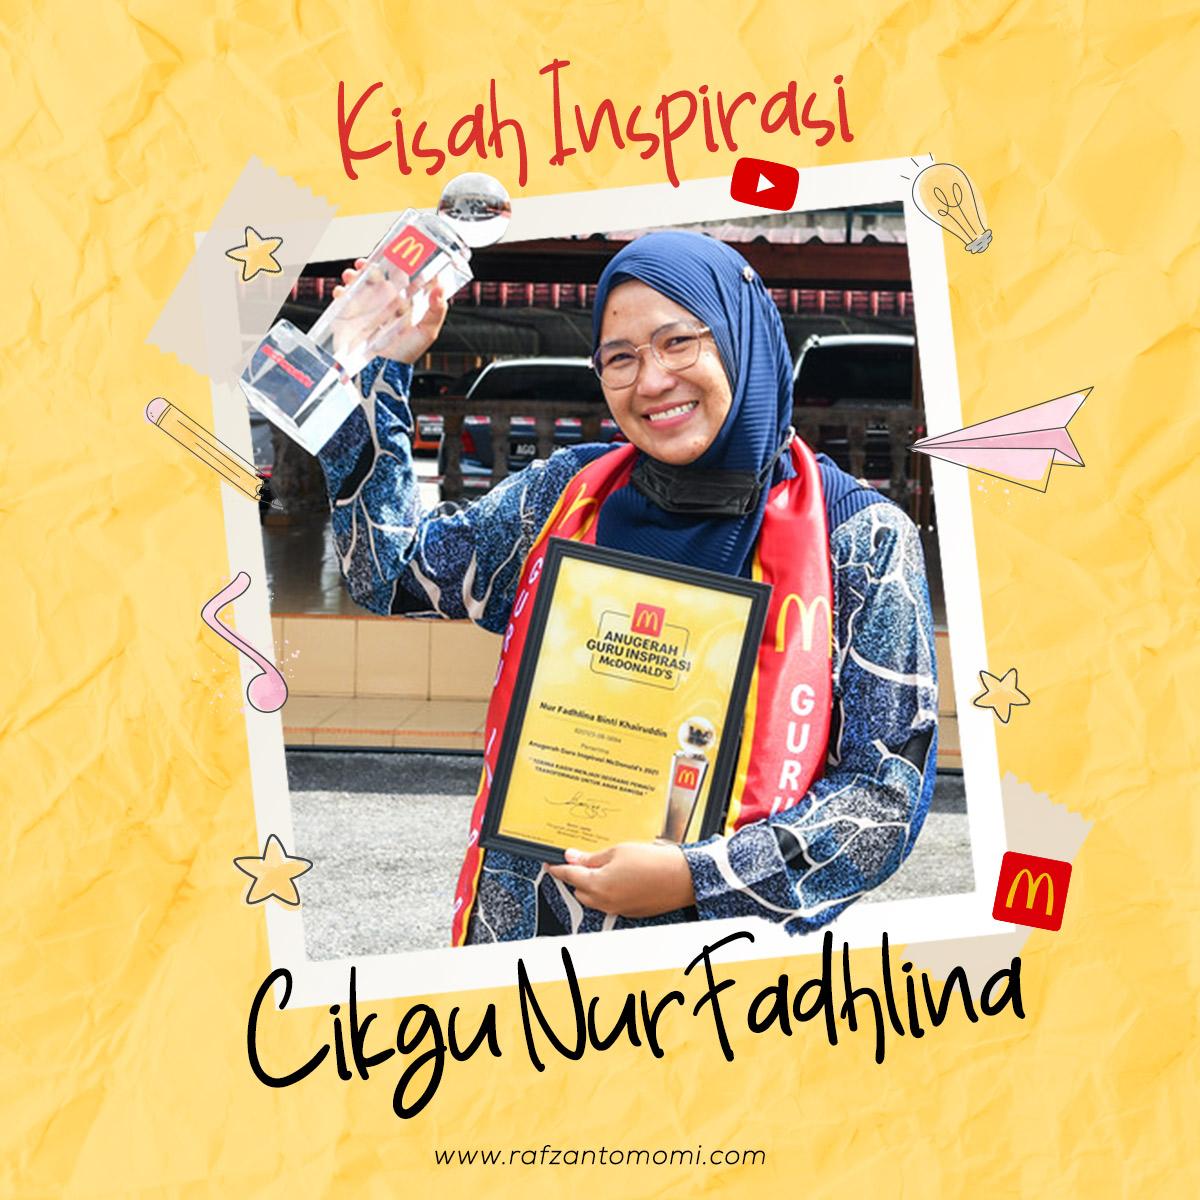 Pemenang Anugerah Guru Inspirasi 2021 - Kisah Inspirasi Cikgu Nur Fadhlina